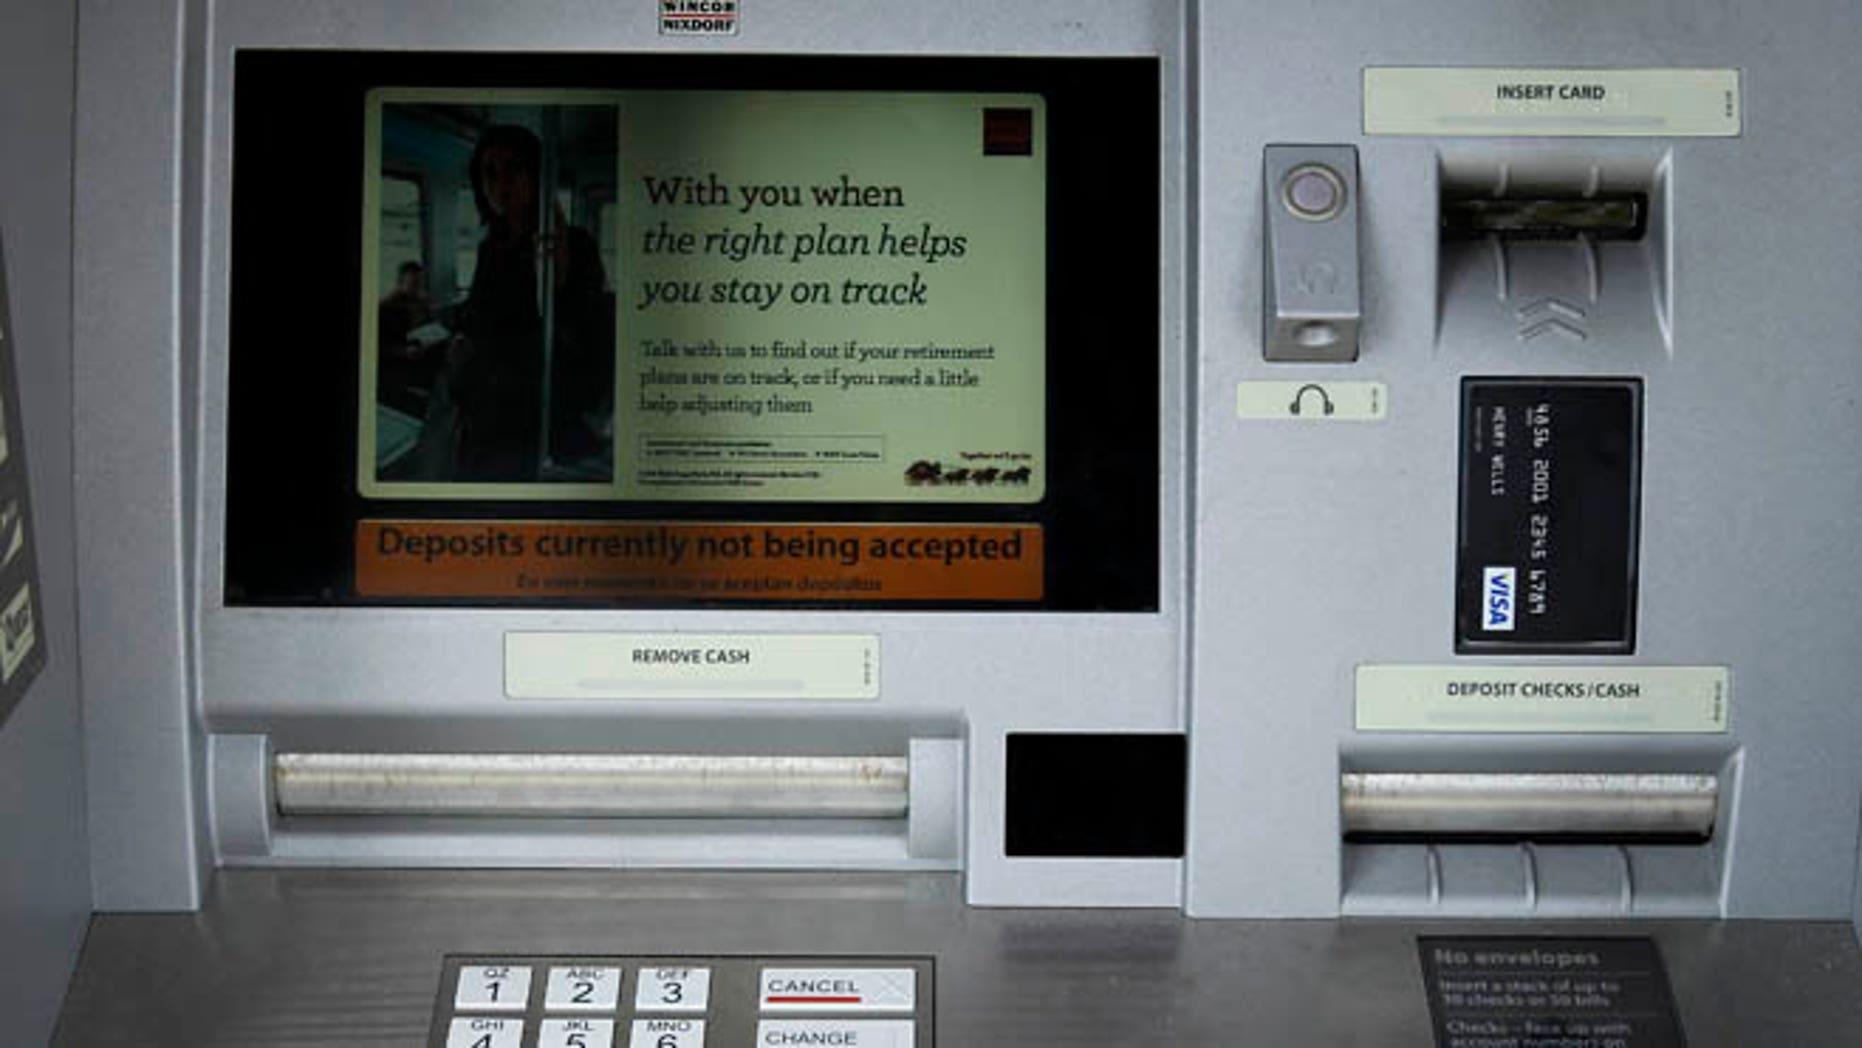 April 19, 2011: A Wells Fargo ATM bank machine is shown here in Solana Beach, California.